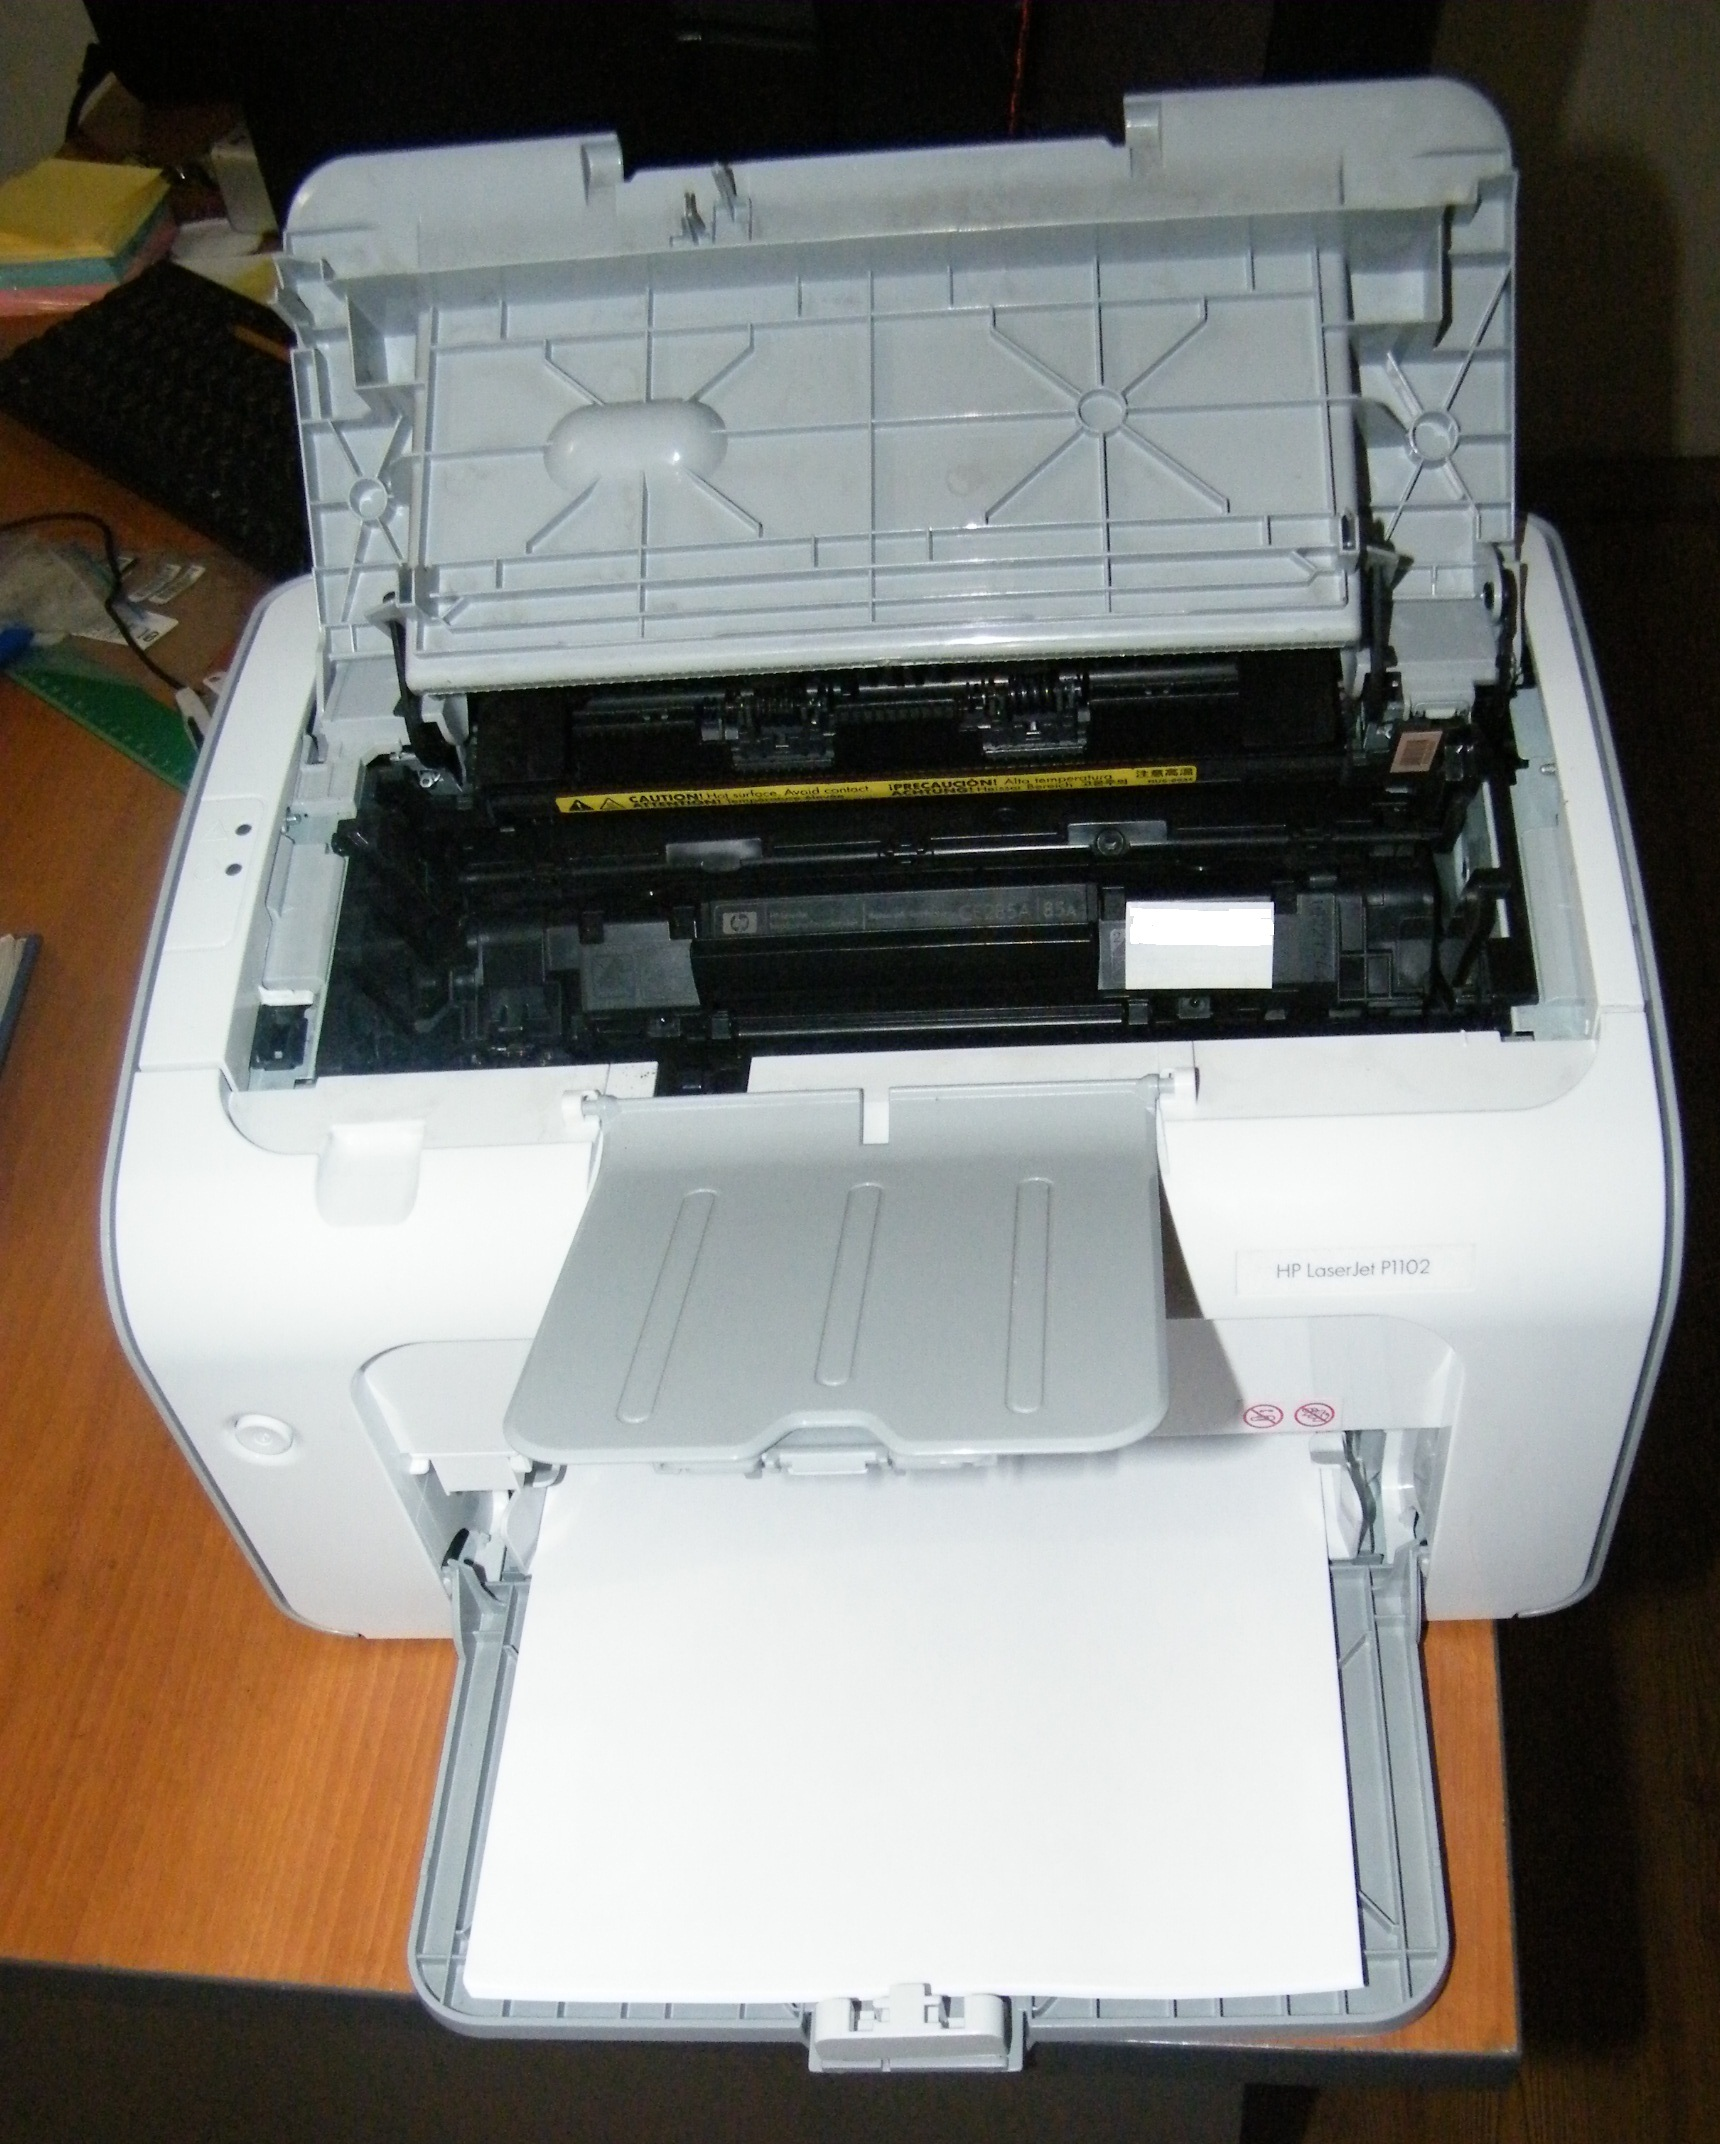 инструкция по разборке принтера hp 1220с